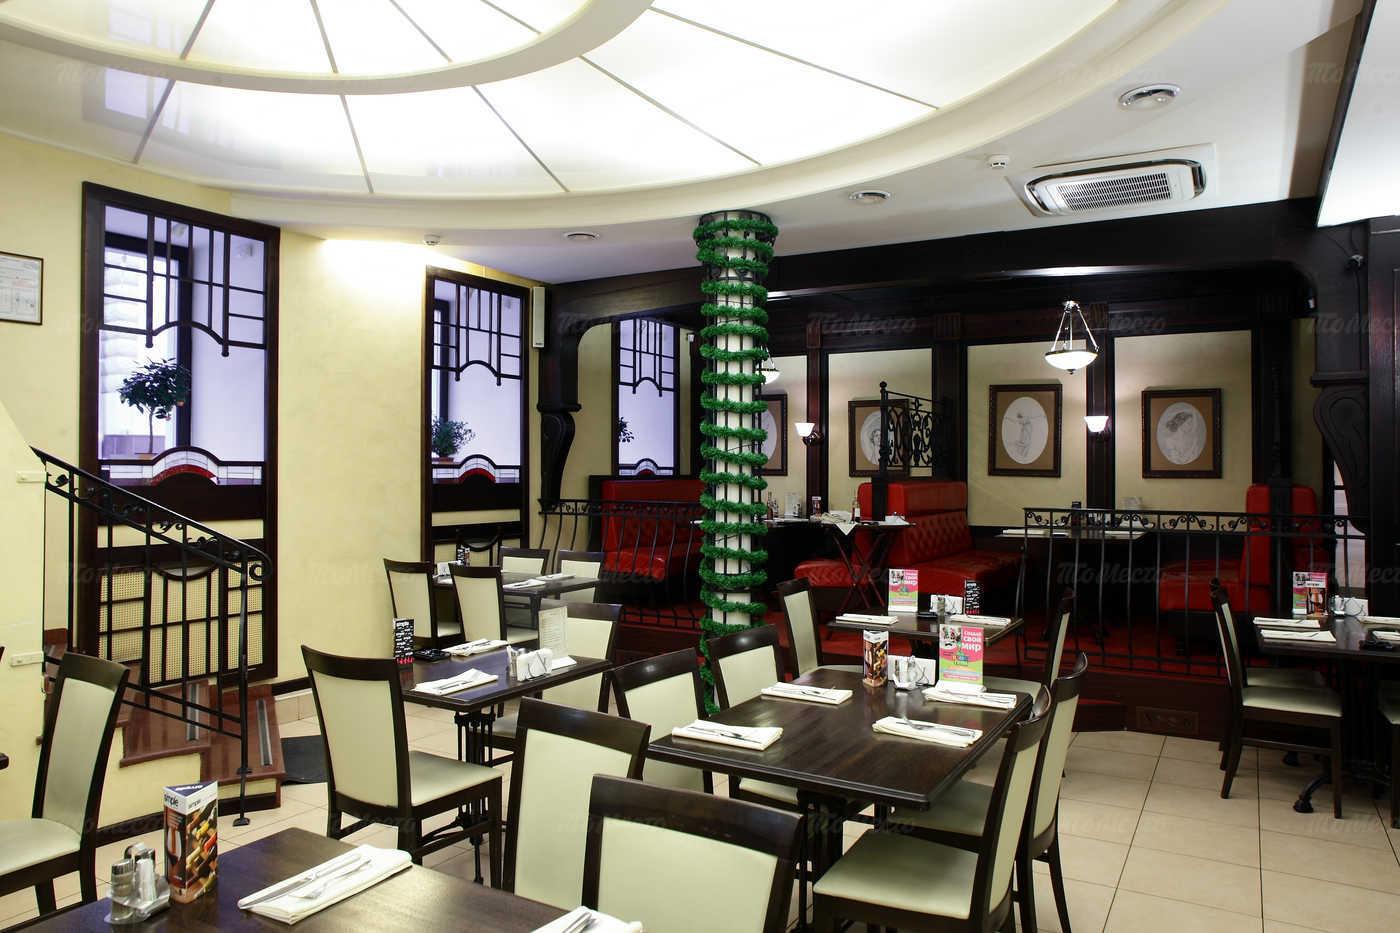 Ресторан Semplice (Траттория Семпличе) на улице Чаплыгина фото 15